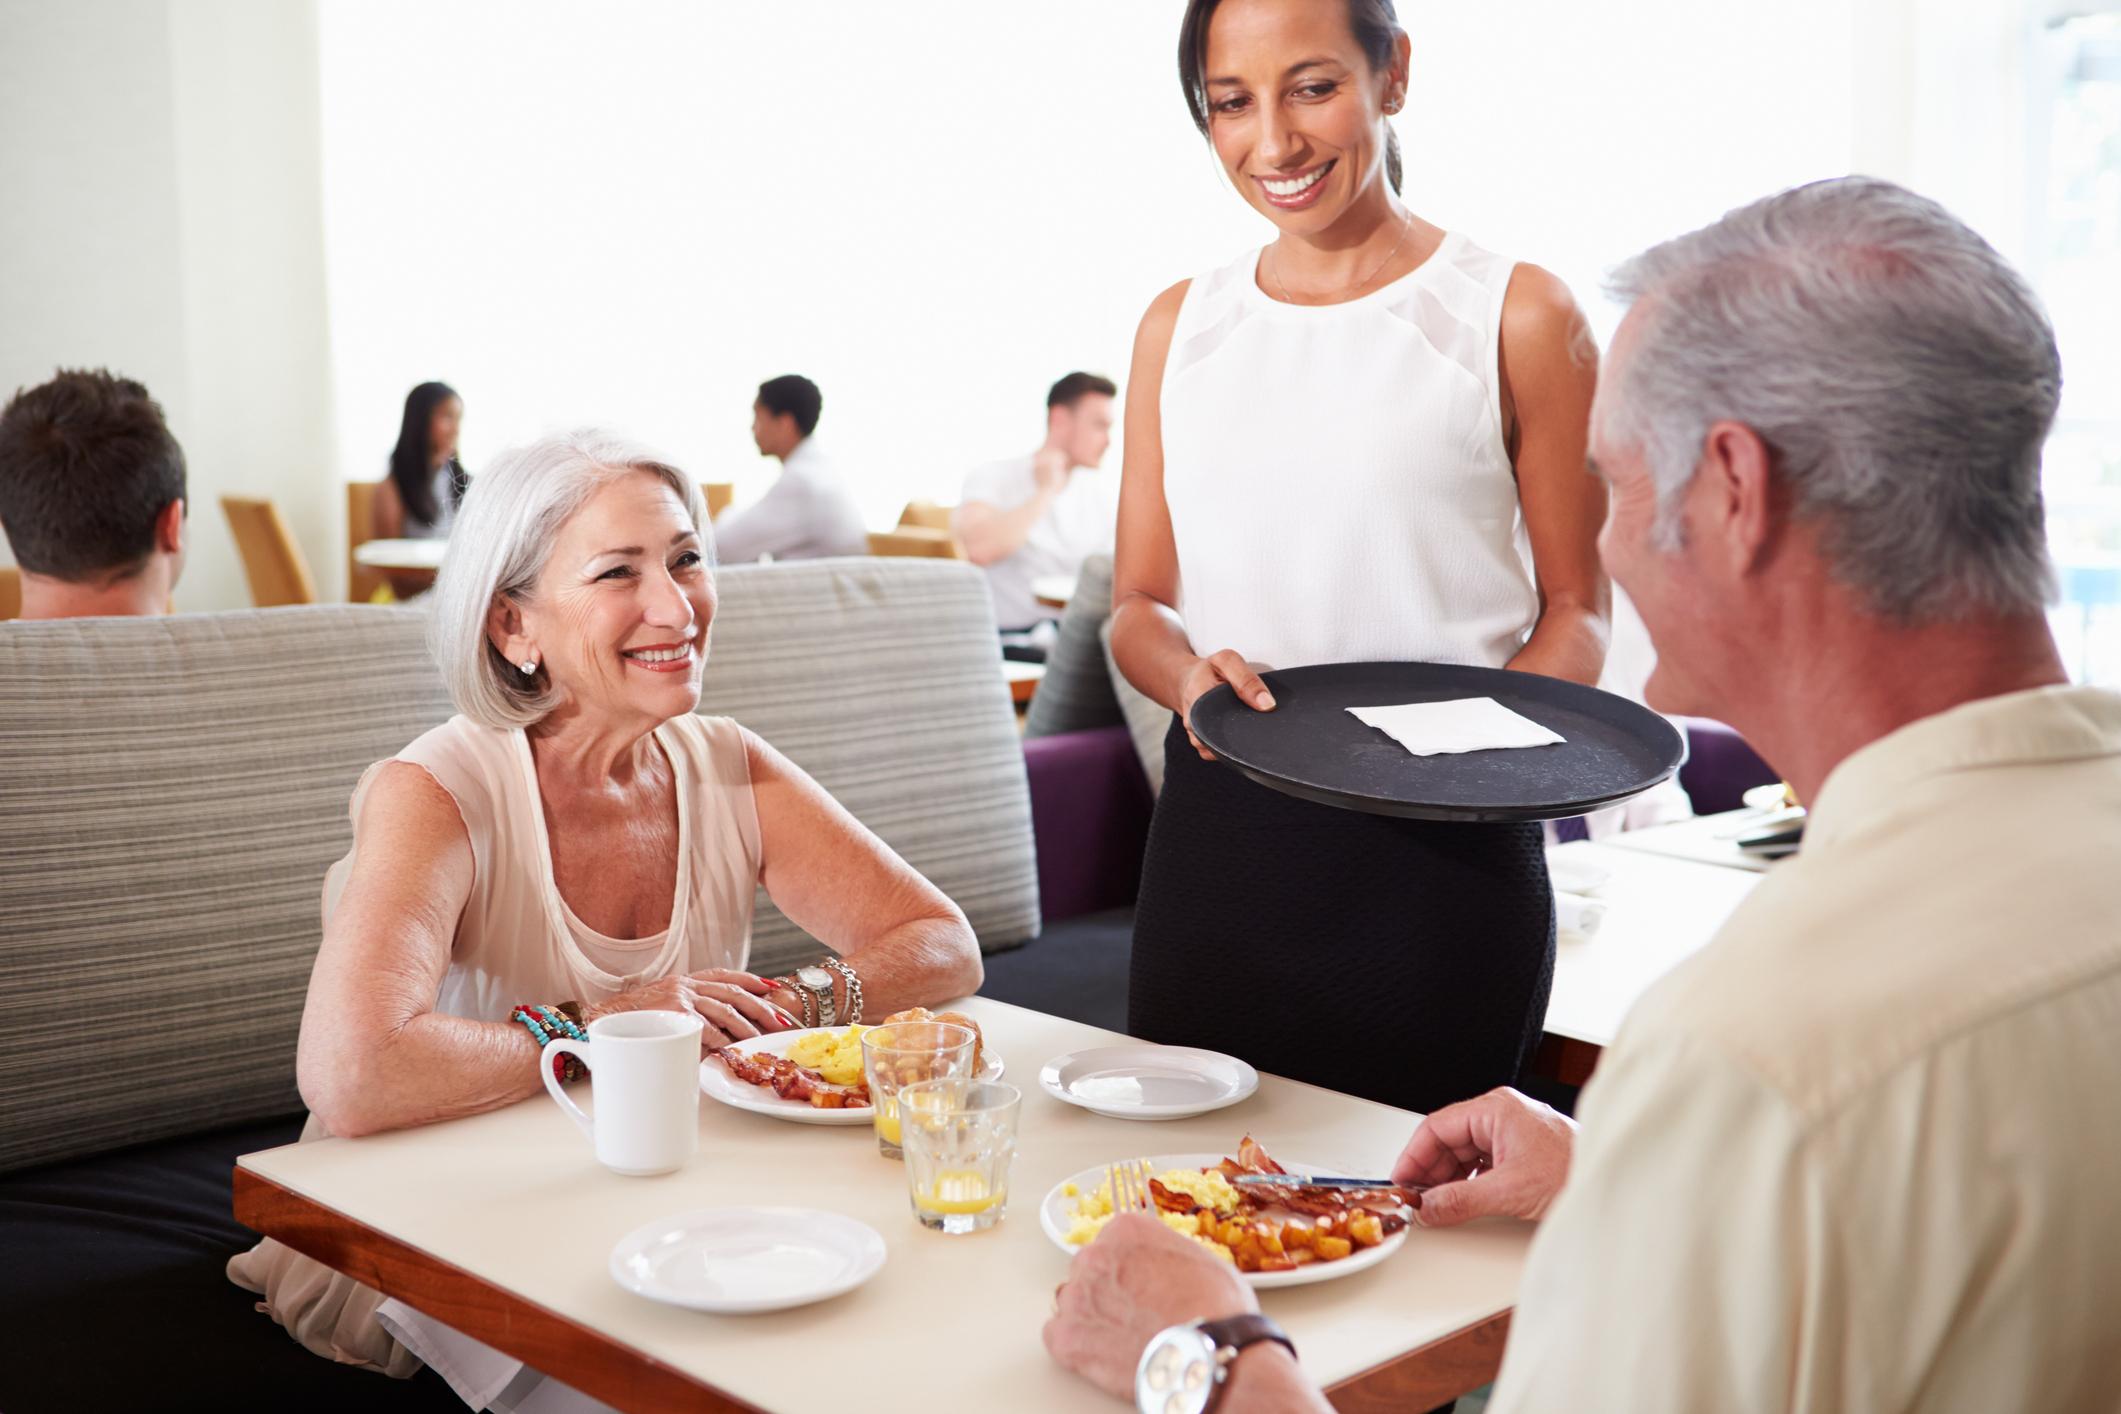 Waitress tending to seniors at a restaurant